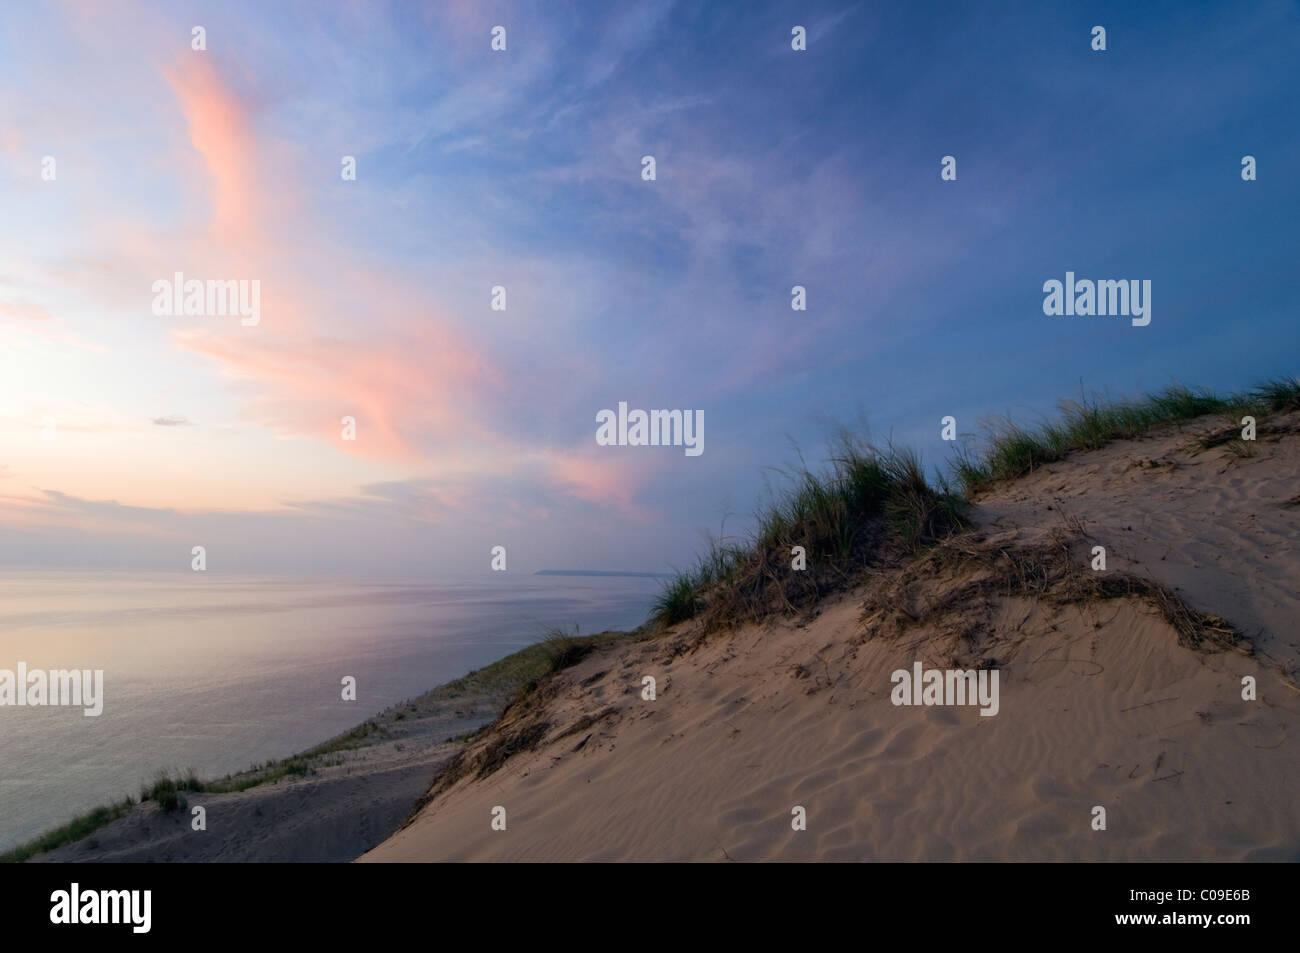 Sunset over Lake Michigan at Sleeping Bear Dunes National Lakeshore, Michigan - Stock Image